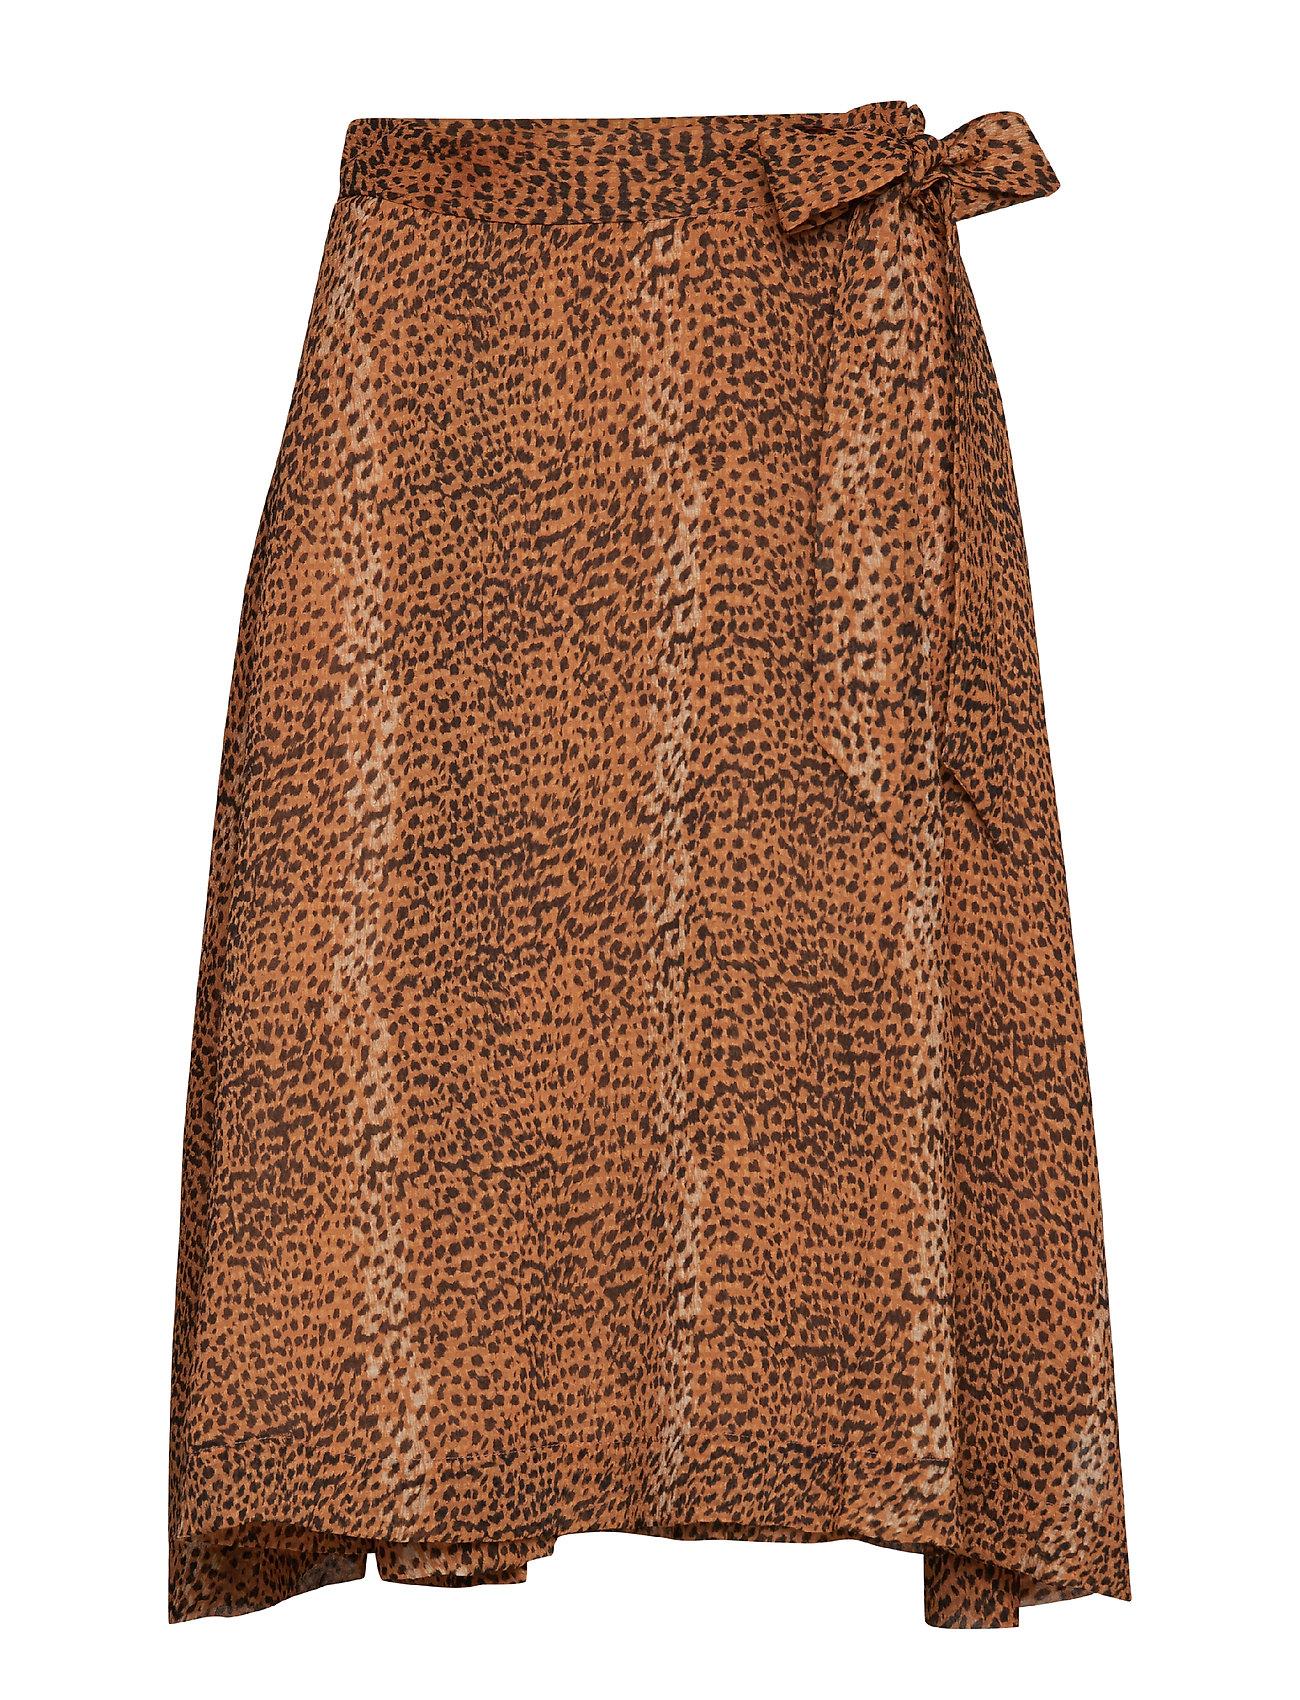 Tanyaiw AnimalInwear Skirtlight Tanyaiw Skirtlight Brown Brown AnimalInwear 34Ac5jLqR